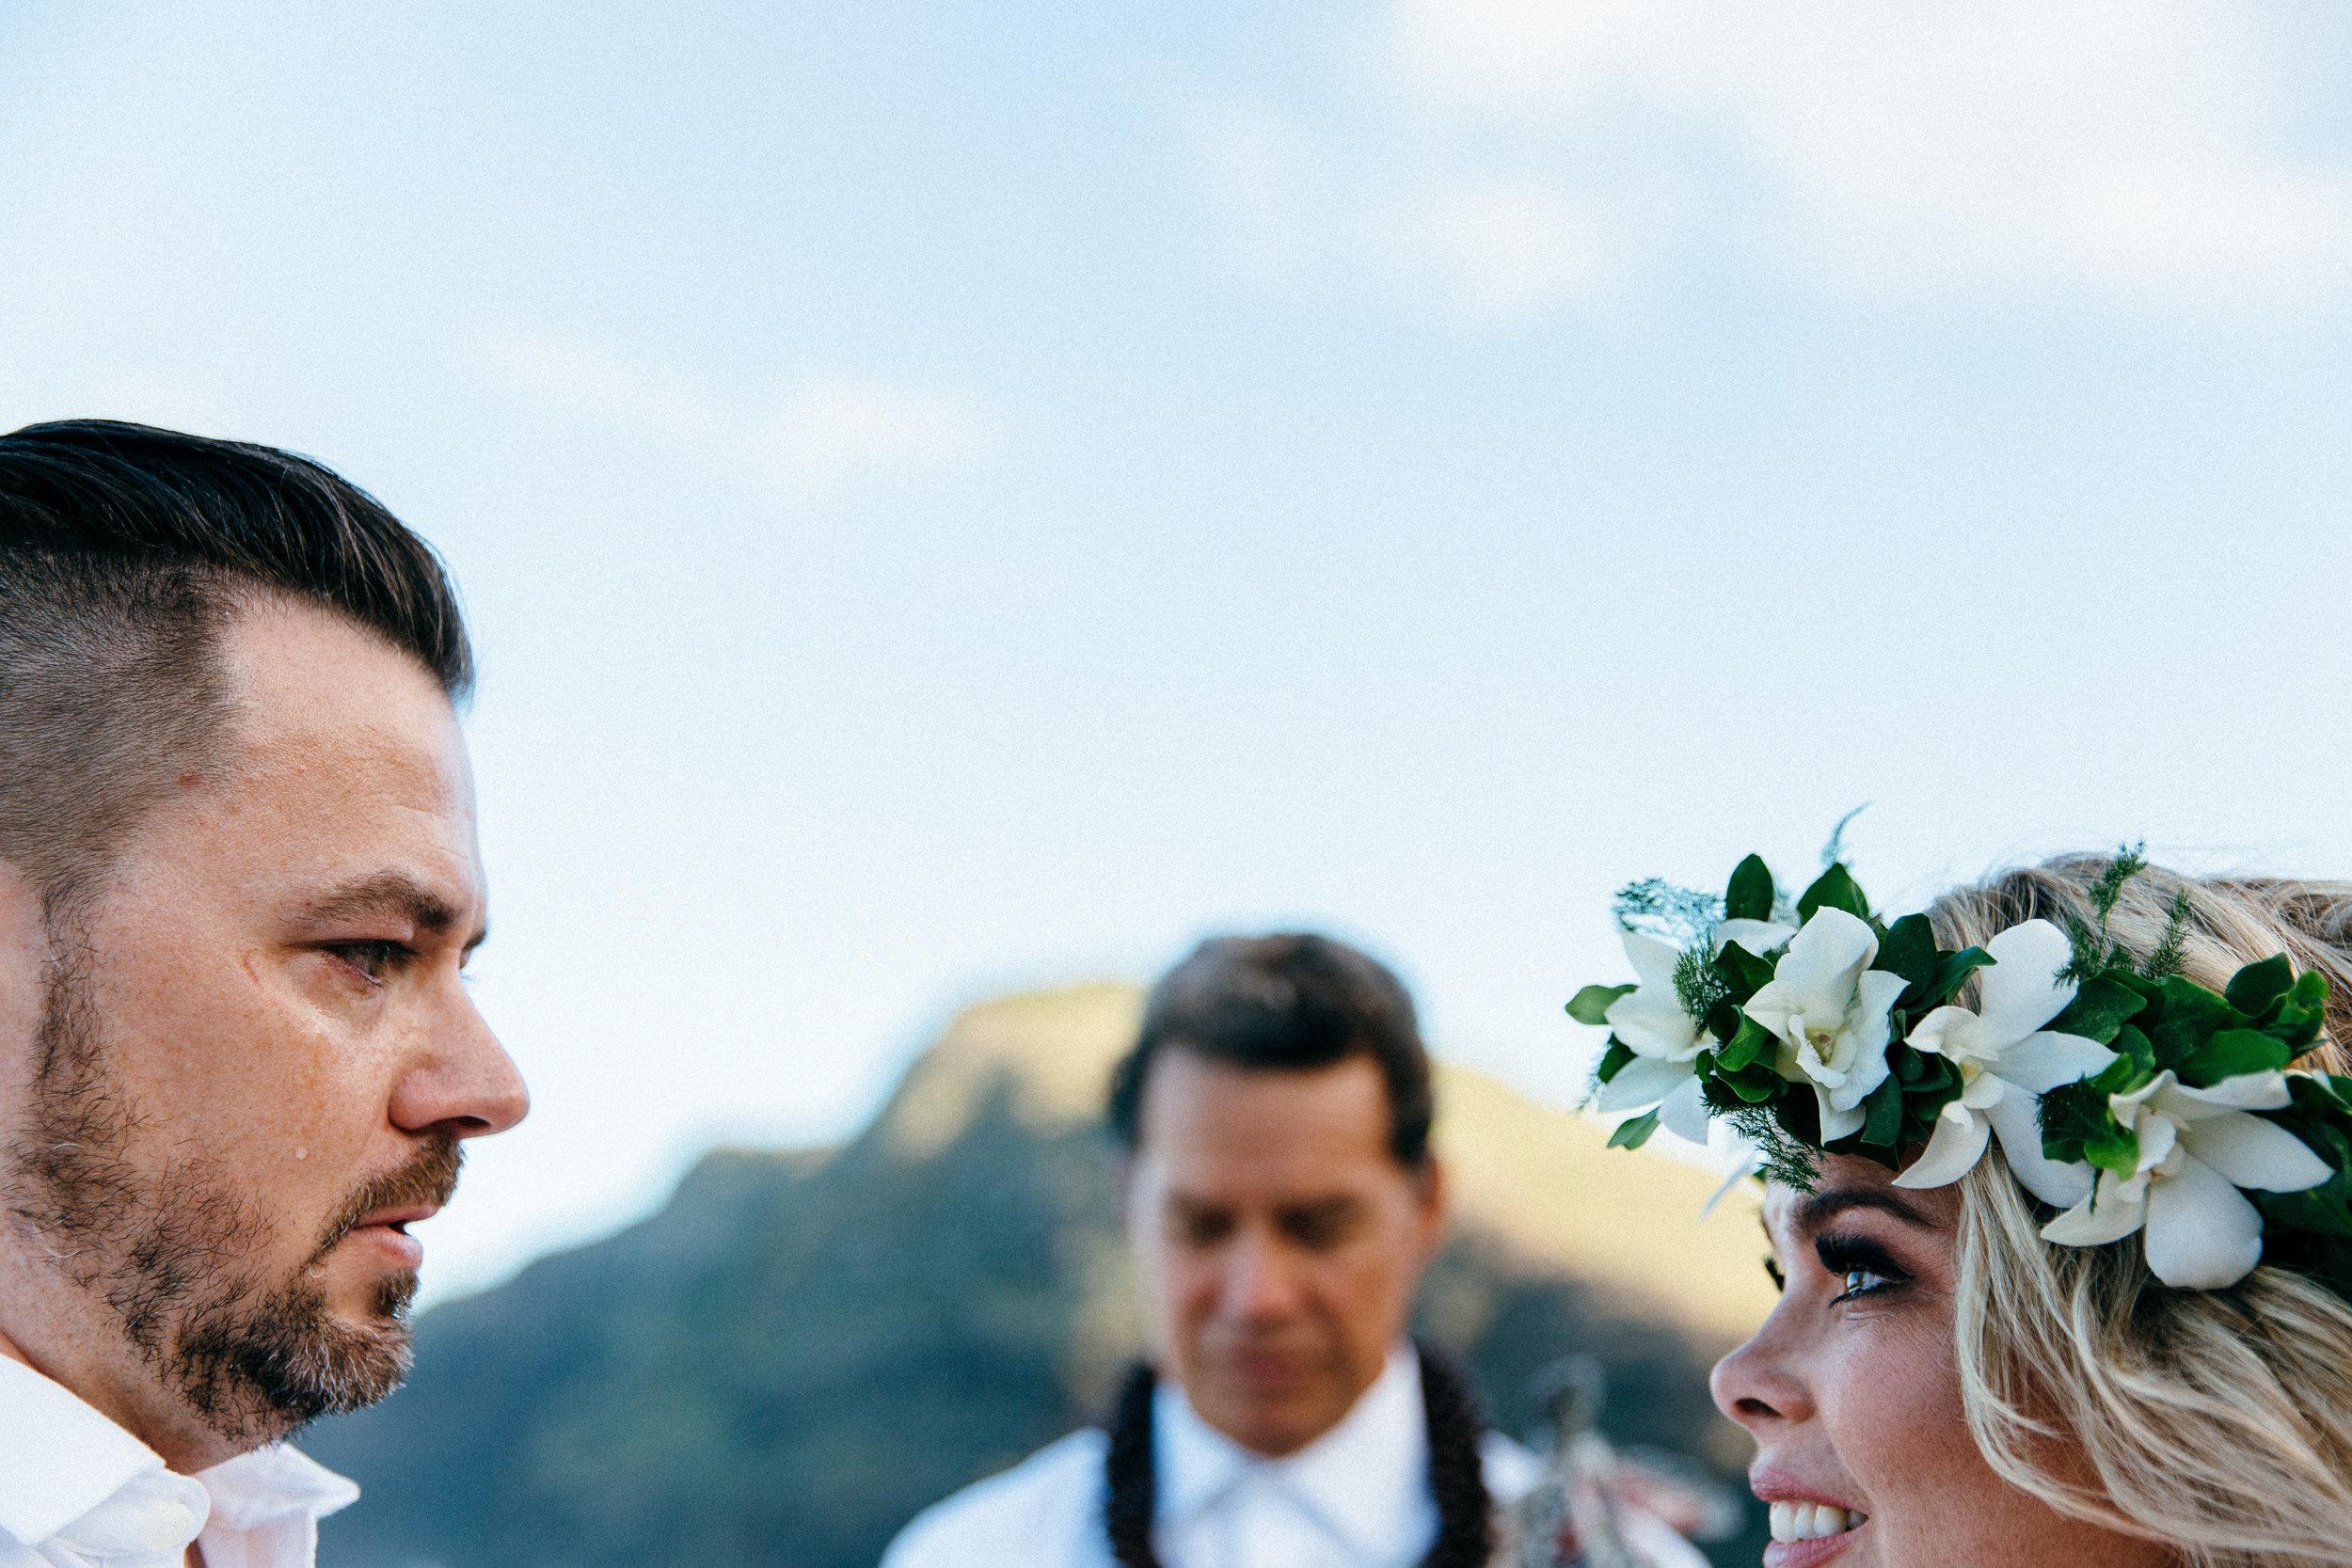 Megan & Travis's emotional wedding vows during their elopement at Makapuu Beach, Honolulu, Hawaii.